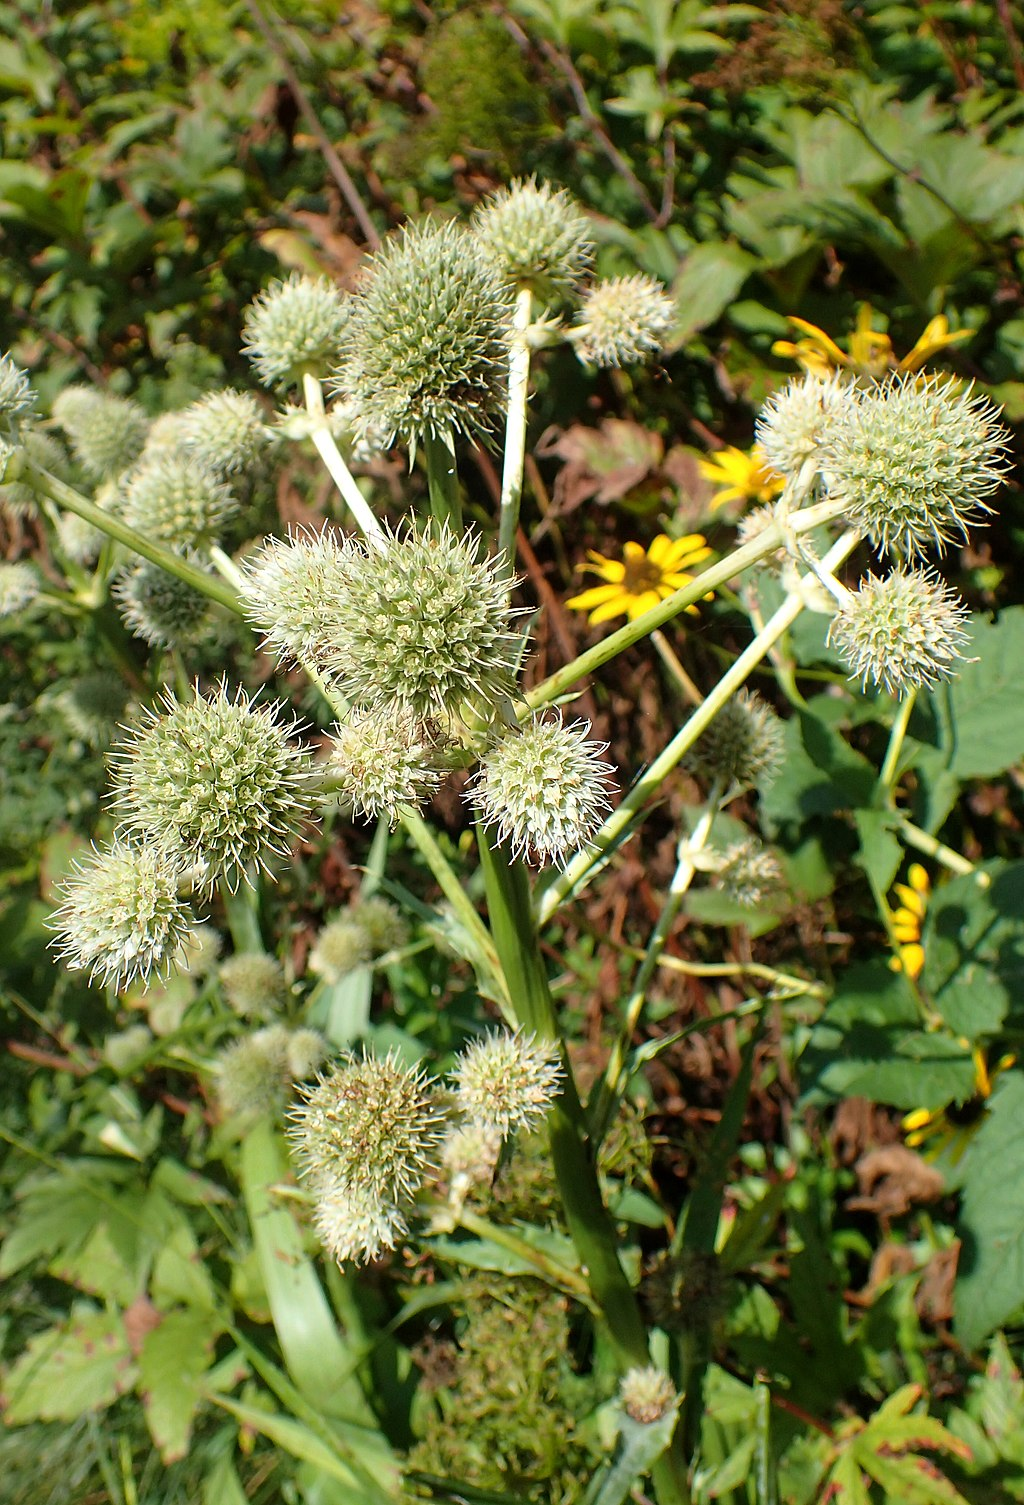 A photo of Eryngium yuccifolium